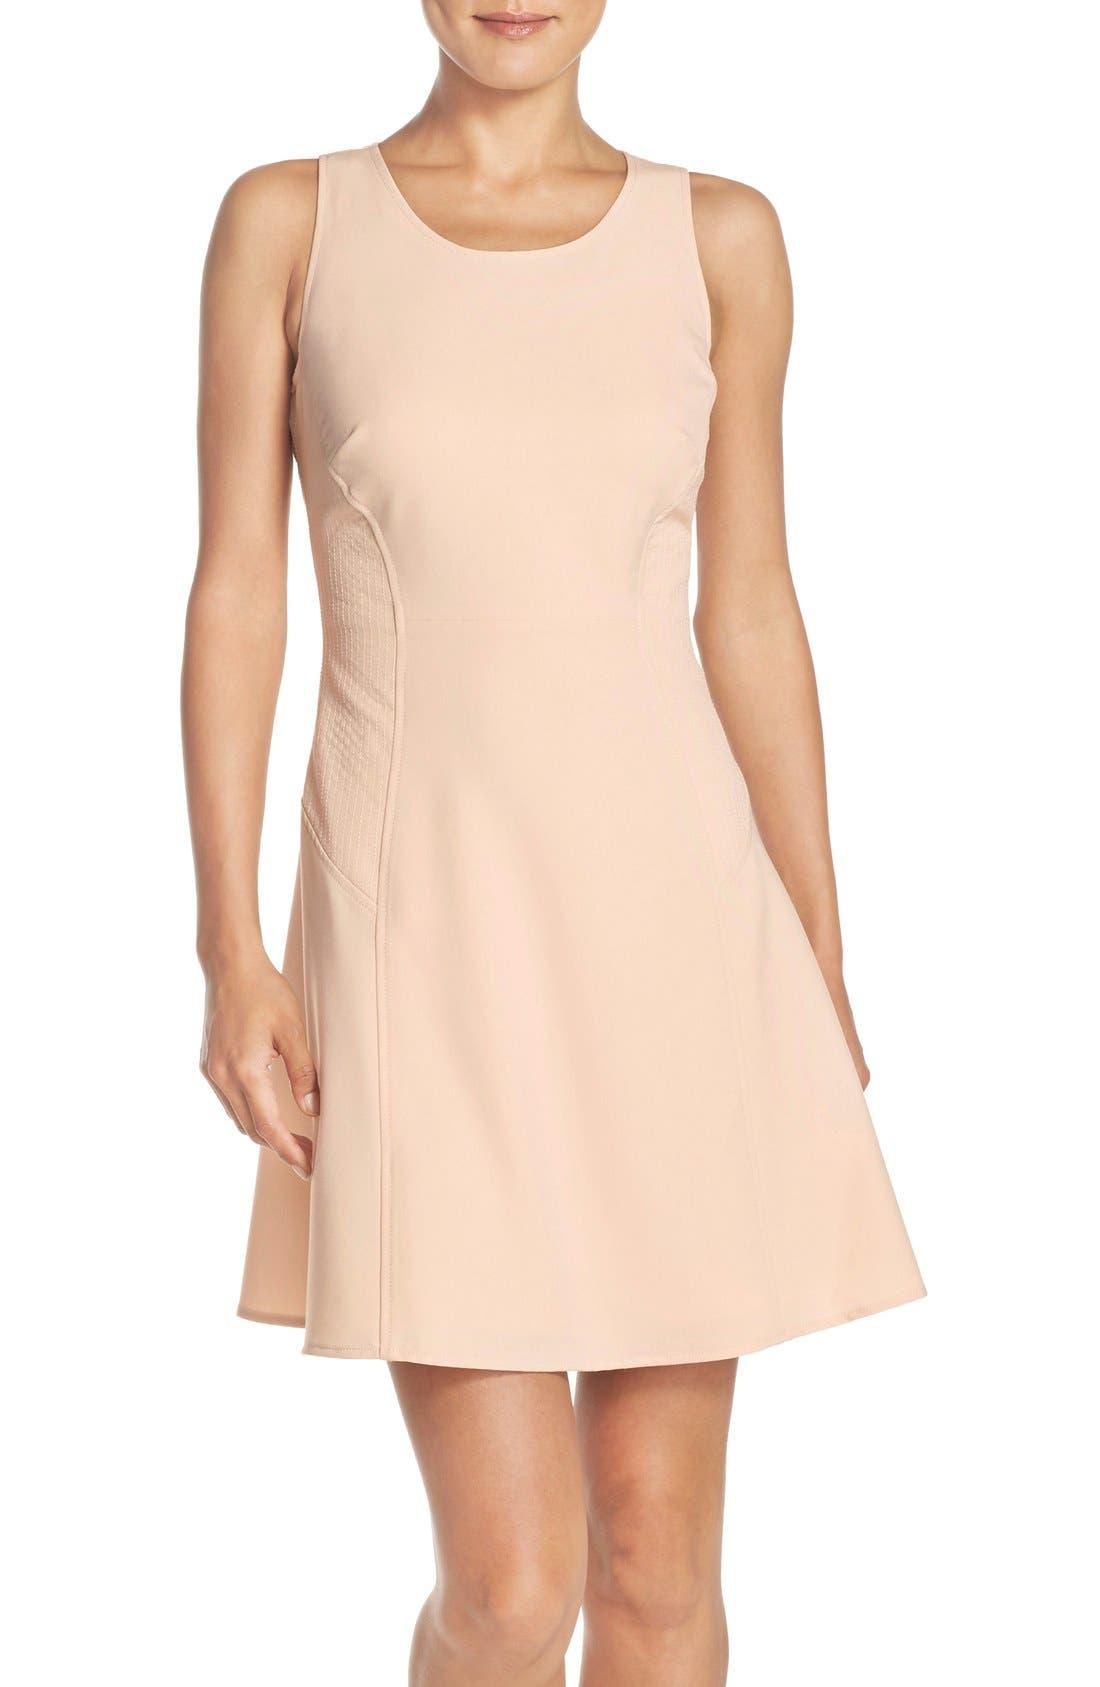 Alternate Image 1 Selected - Marc New York Scoop Neck Crepe Fit & Flare Dress